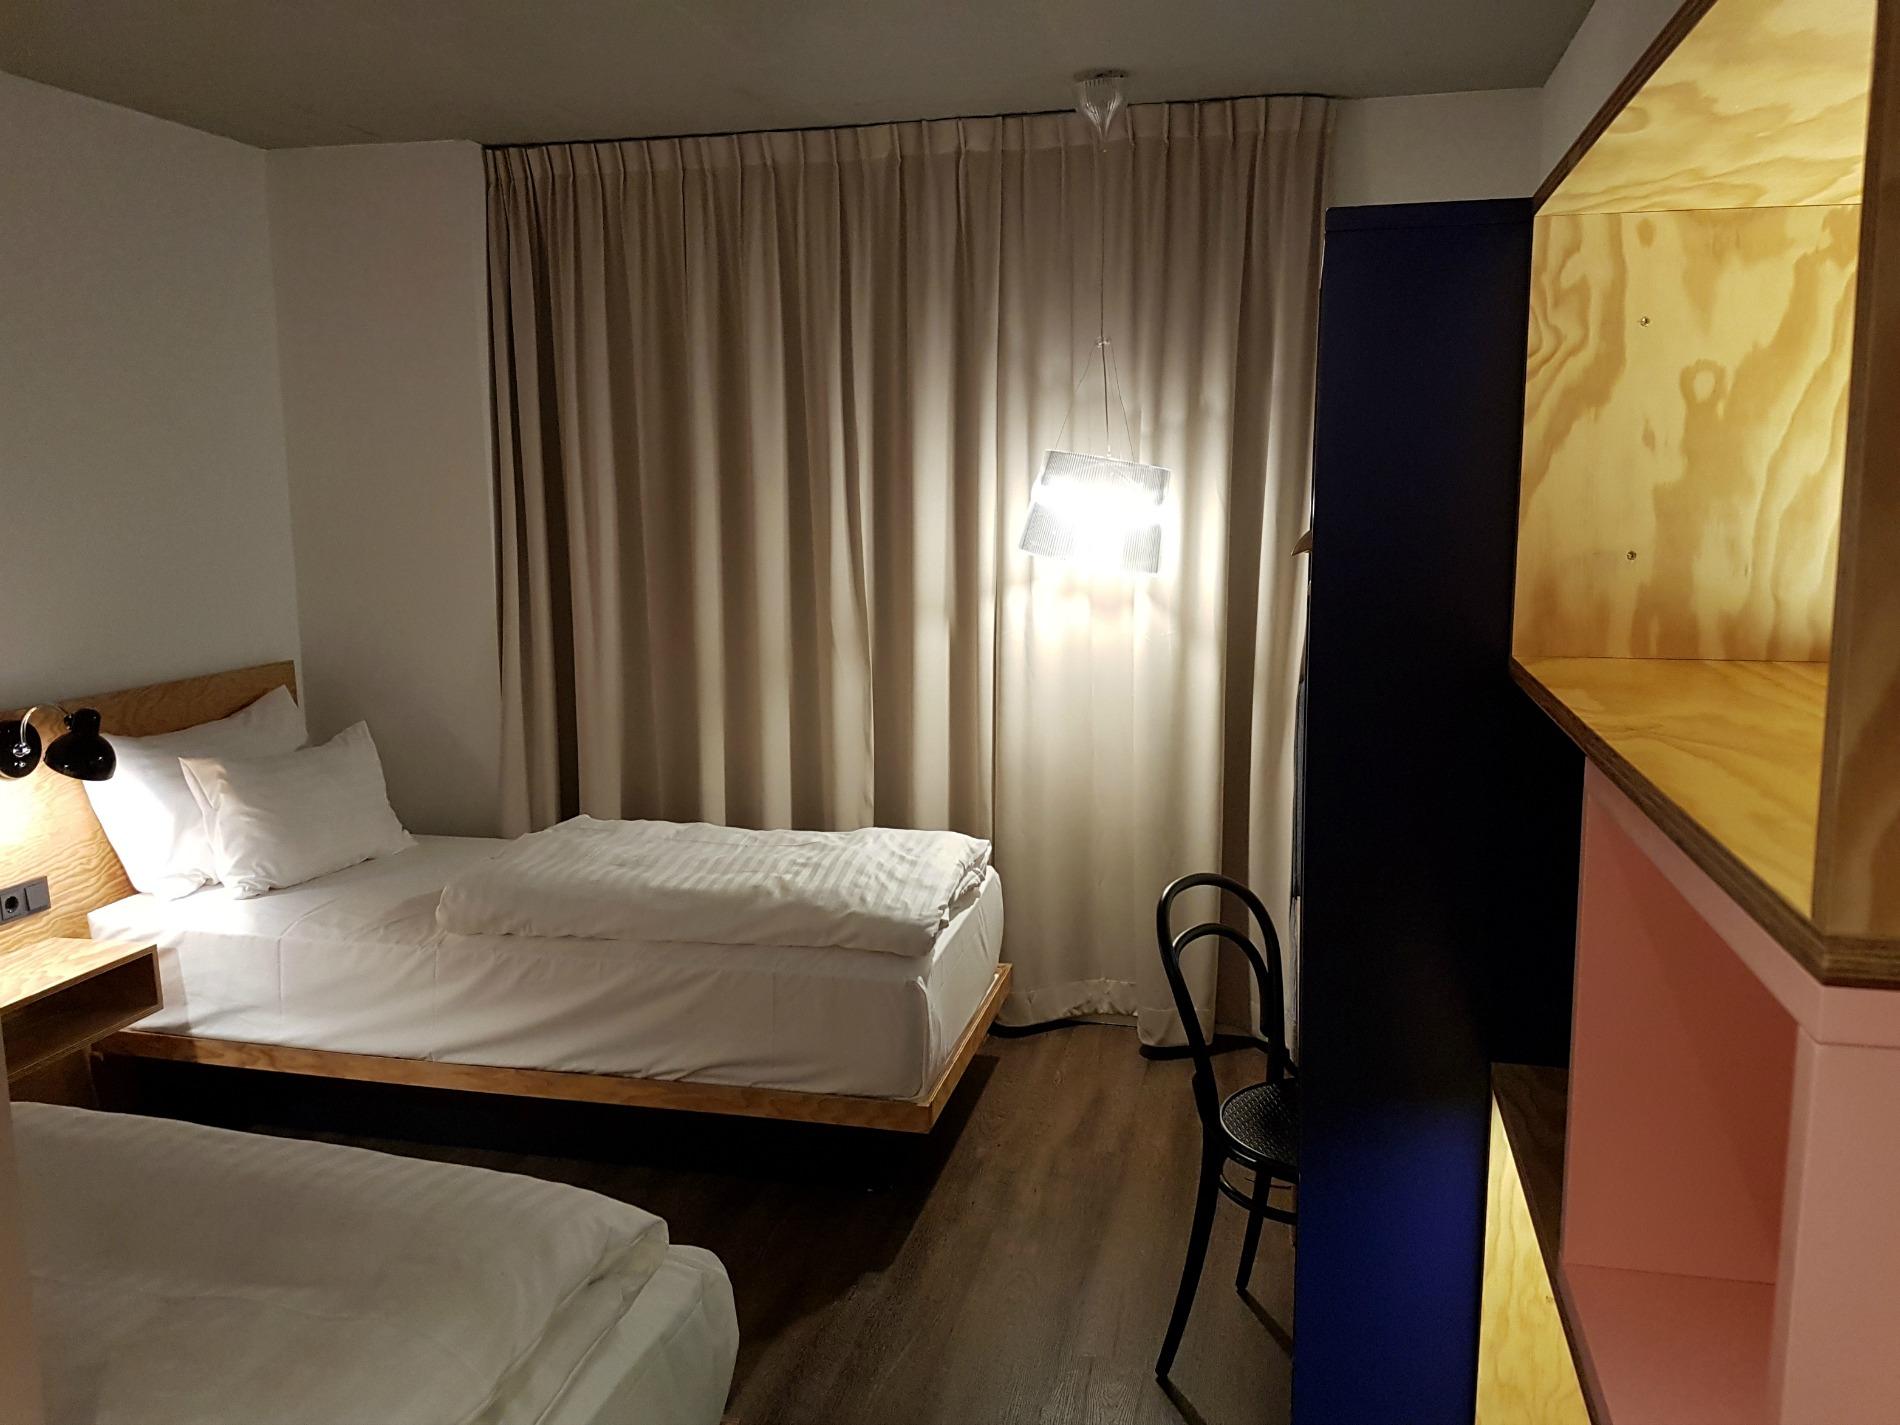 hotel-schani-wien-accessible-room